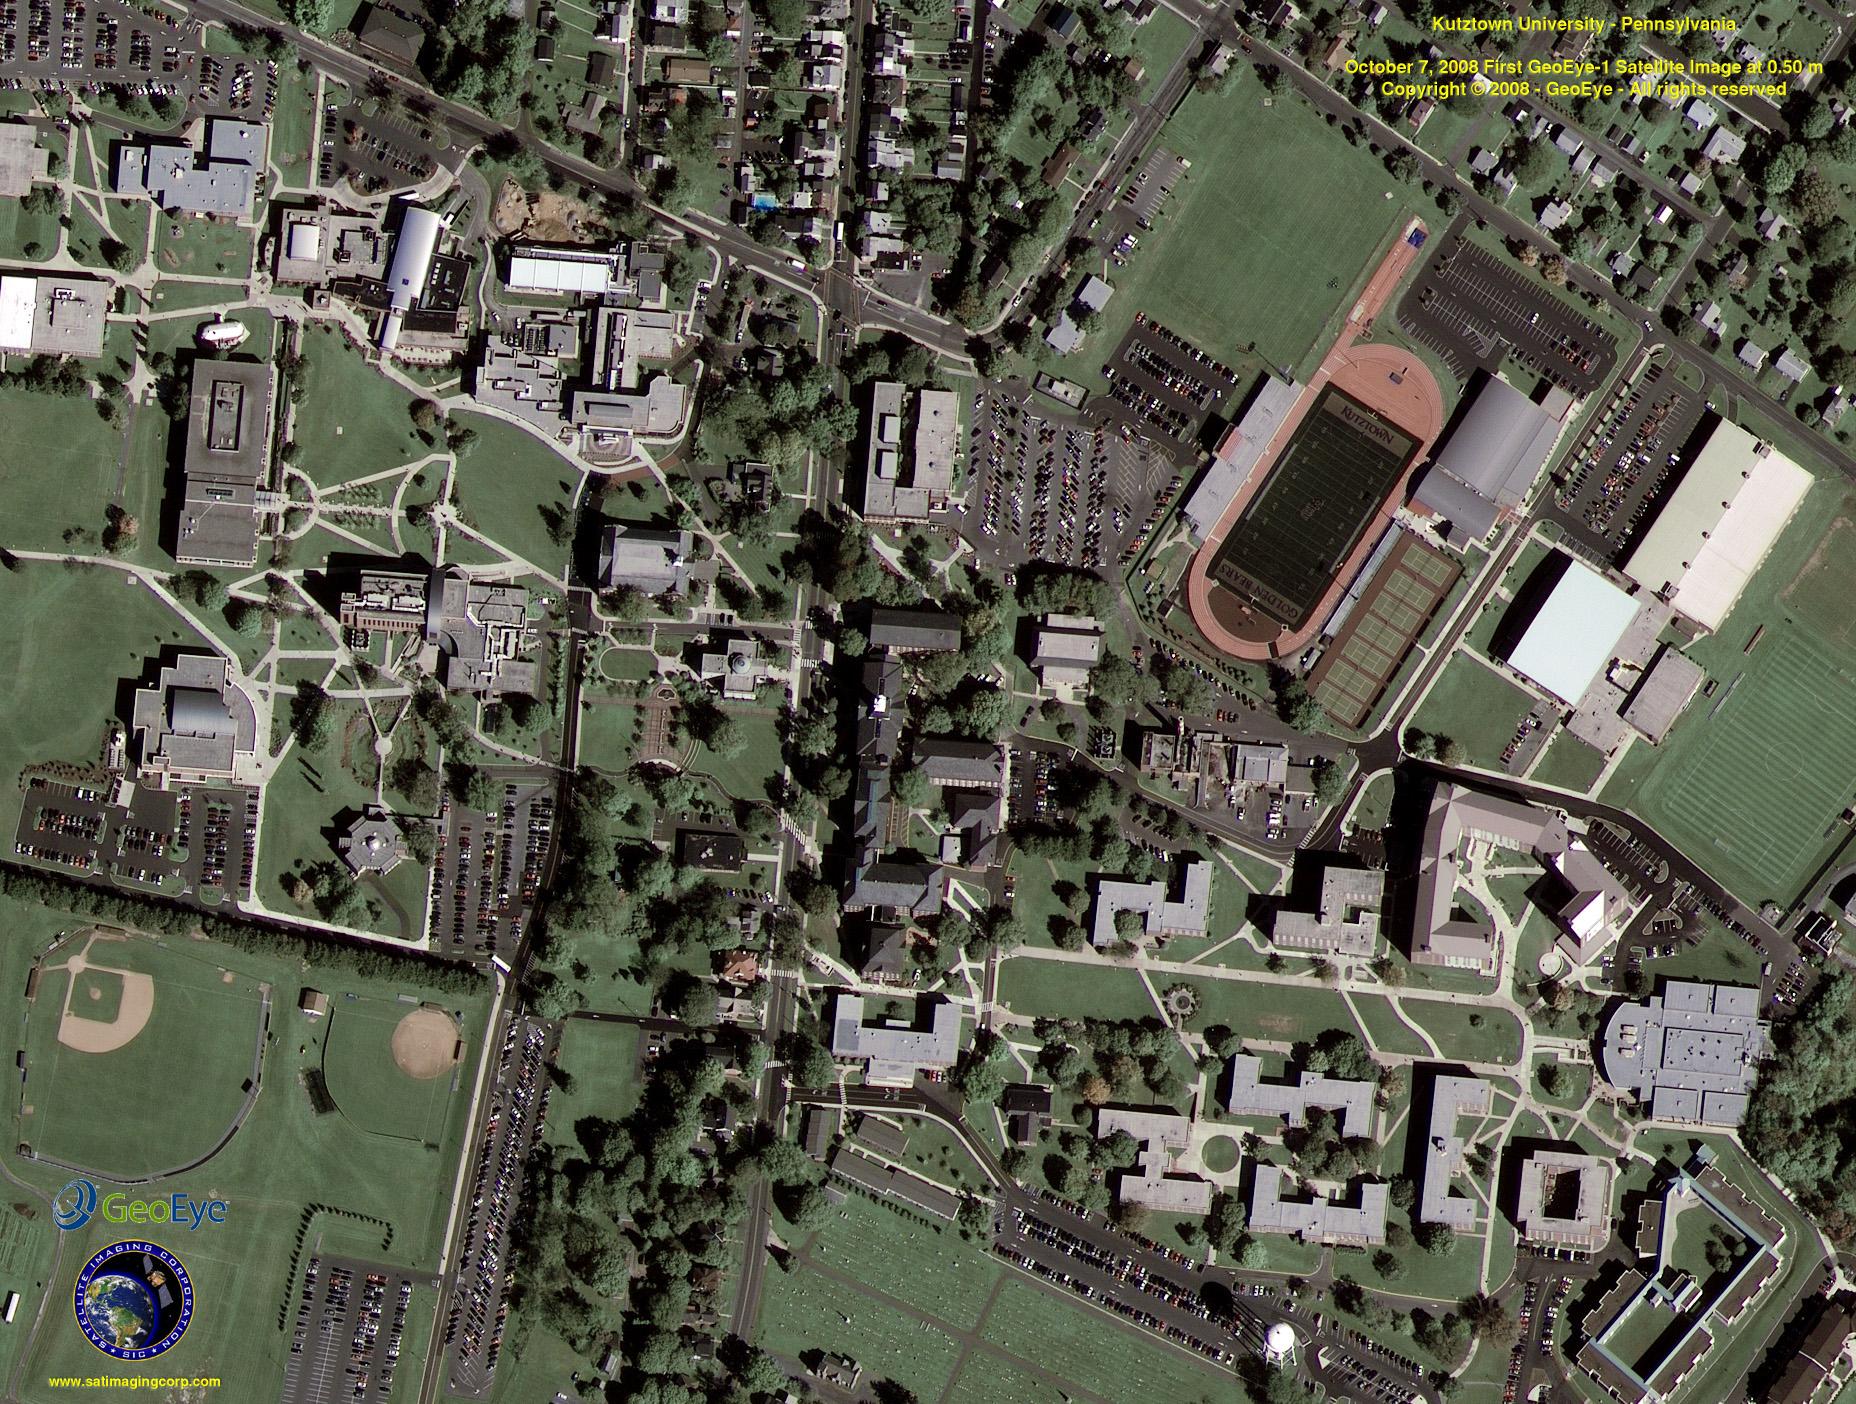 Google maps earth satellite - Geoeye 1 Satellite Image Of Kutztown University Download Image Google Maps